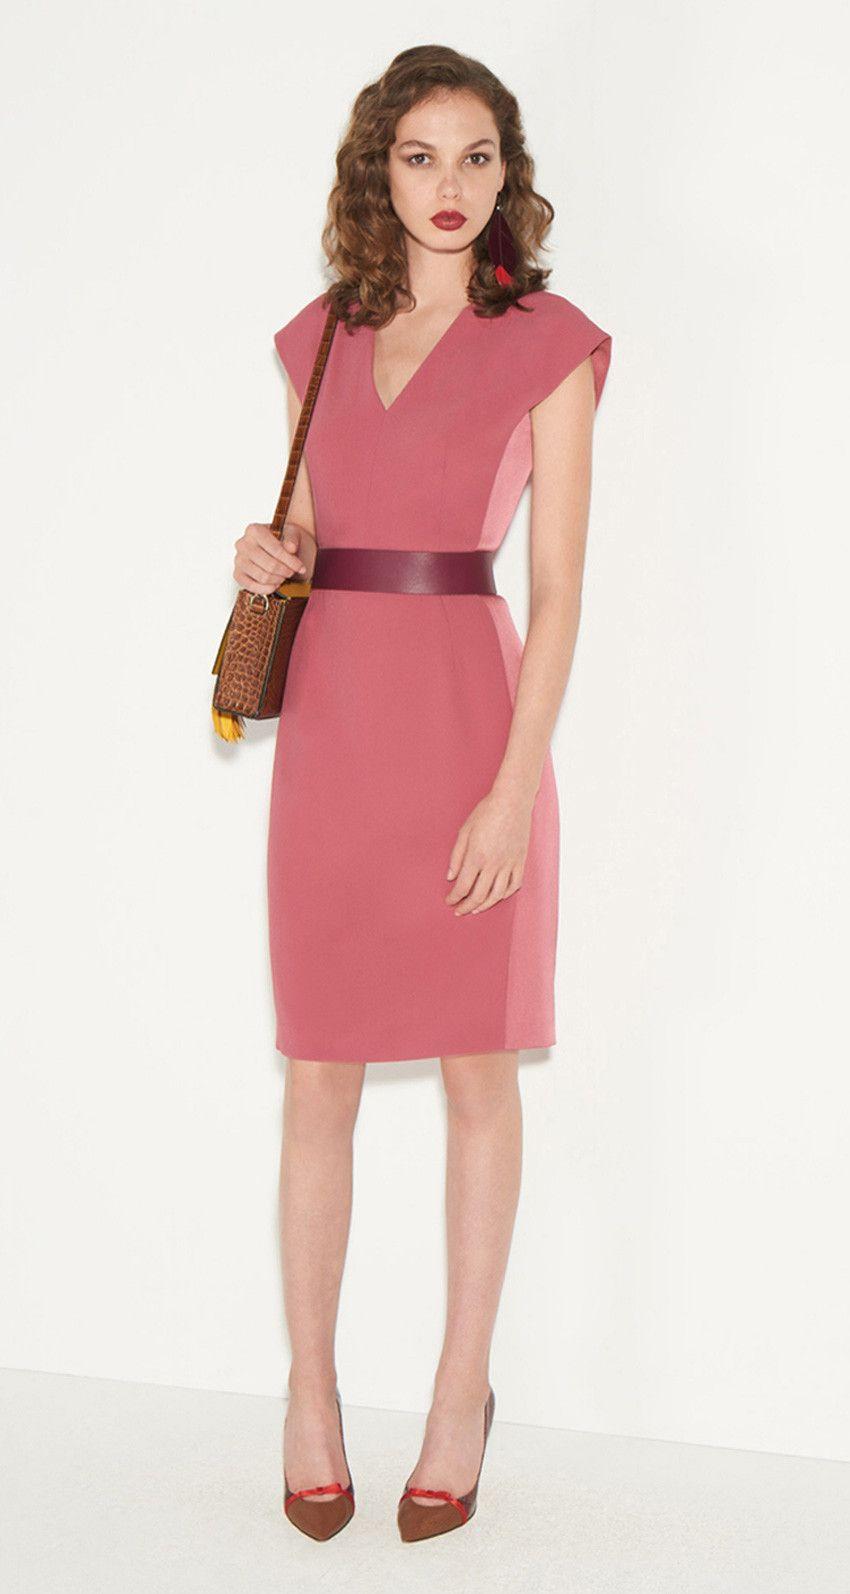 Satin-backed crepe dress - Paule KA   Nice clothes Sept 17   Pinterest